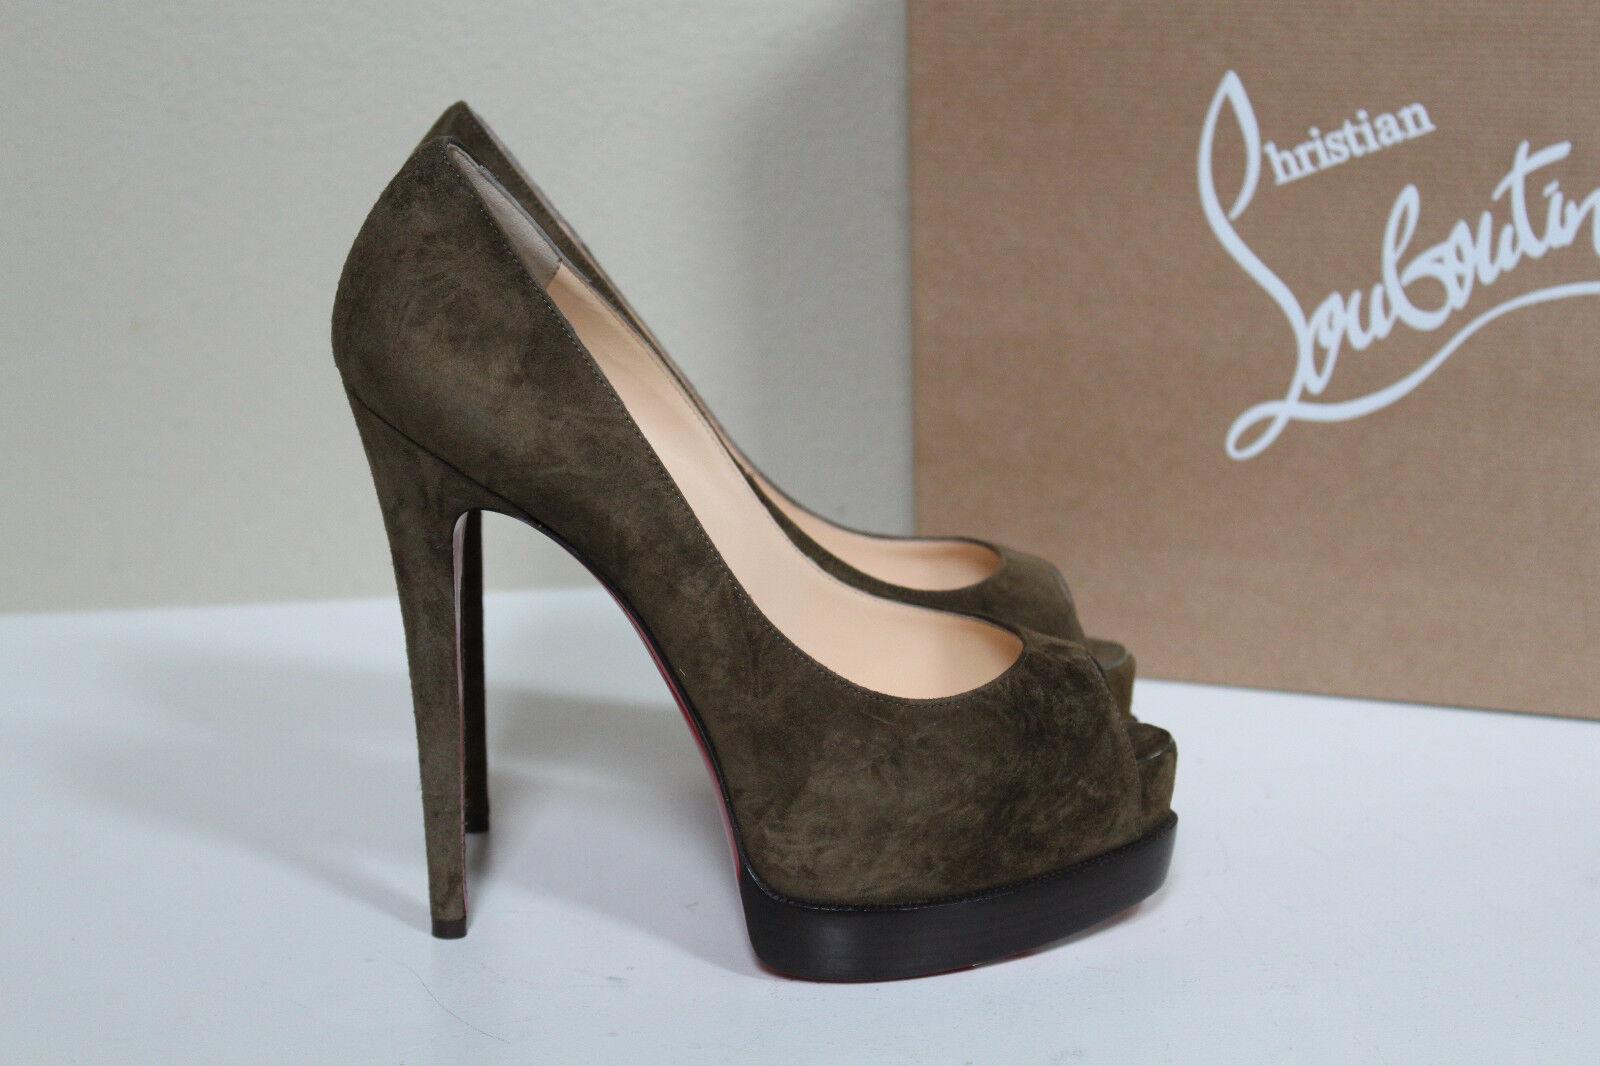 New Christian Louboutin Palais Royal Brown Suede Platform Pump shoes sz 7   37